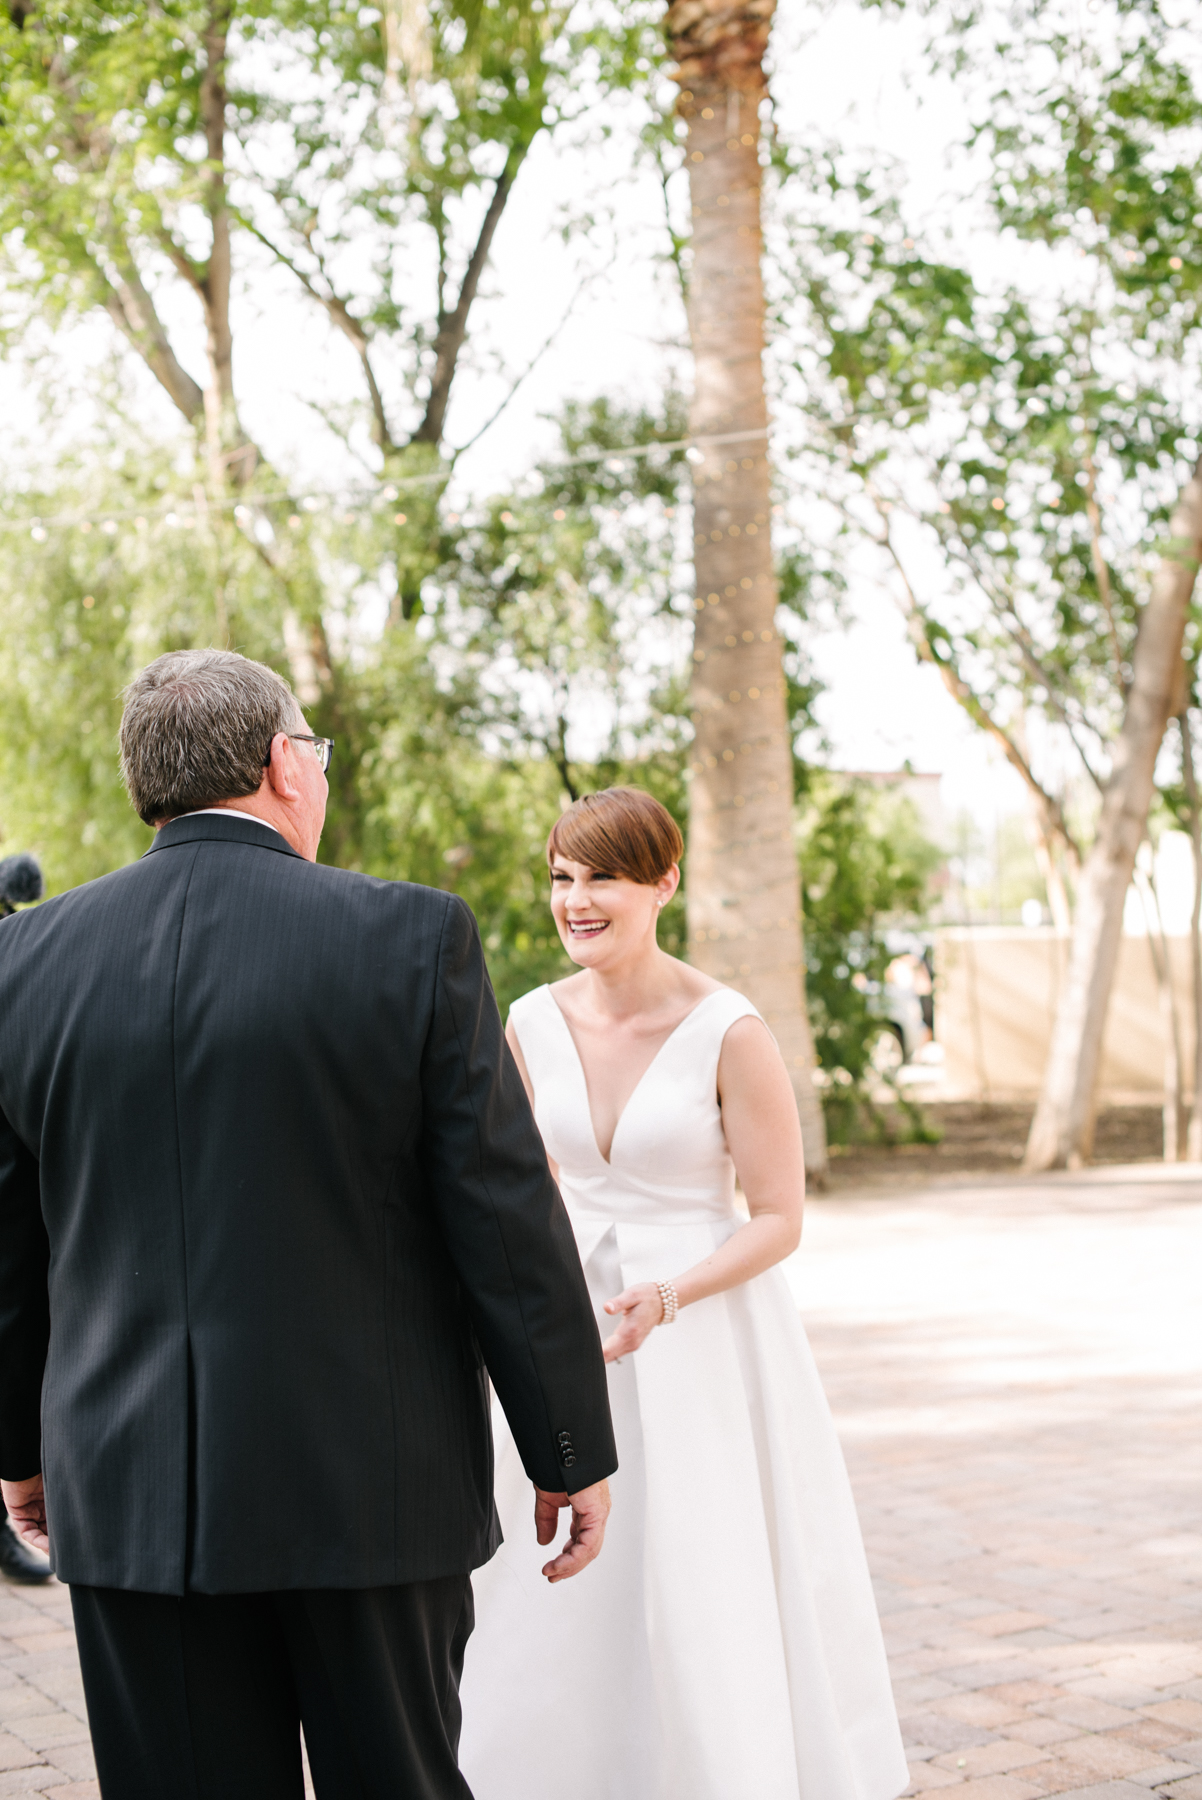 Secret Garden Event Center Wedding - Meredith Amadee Photography-42.jpg